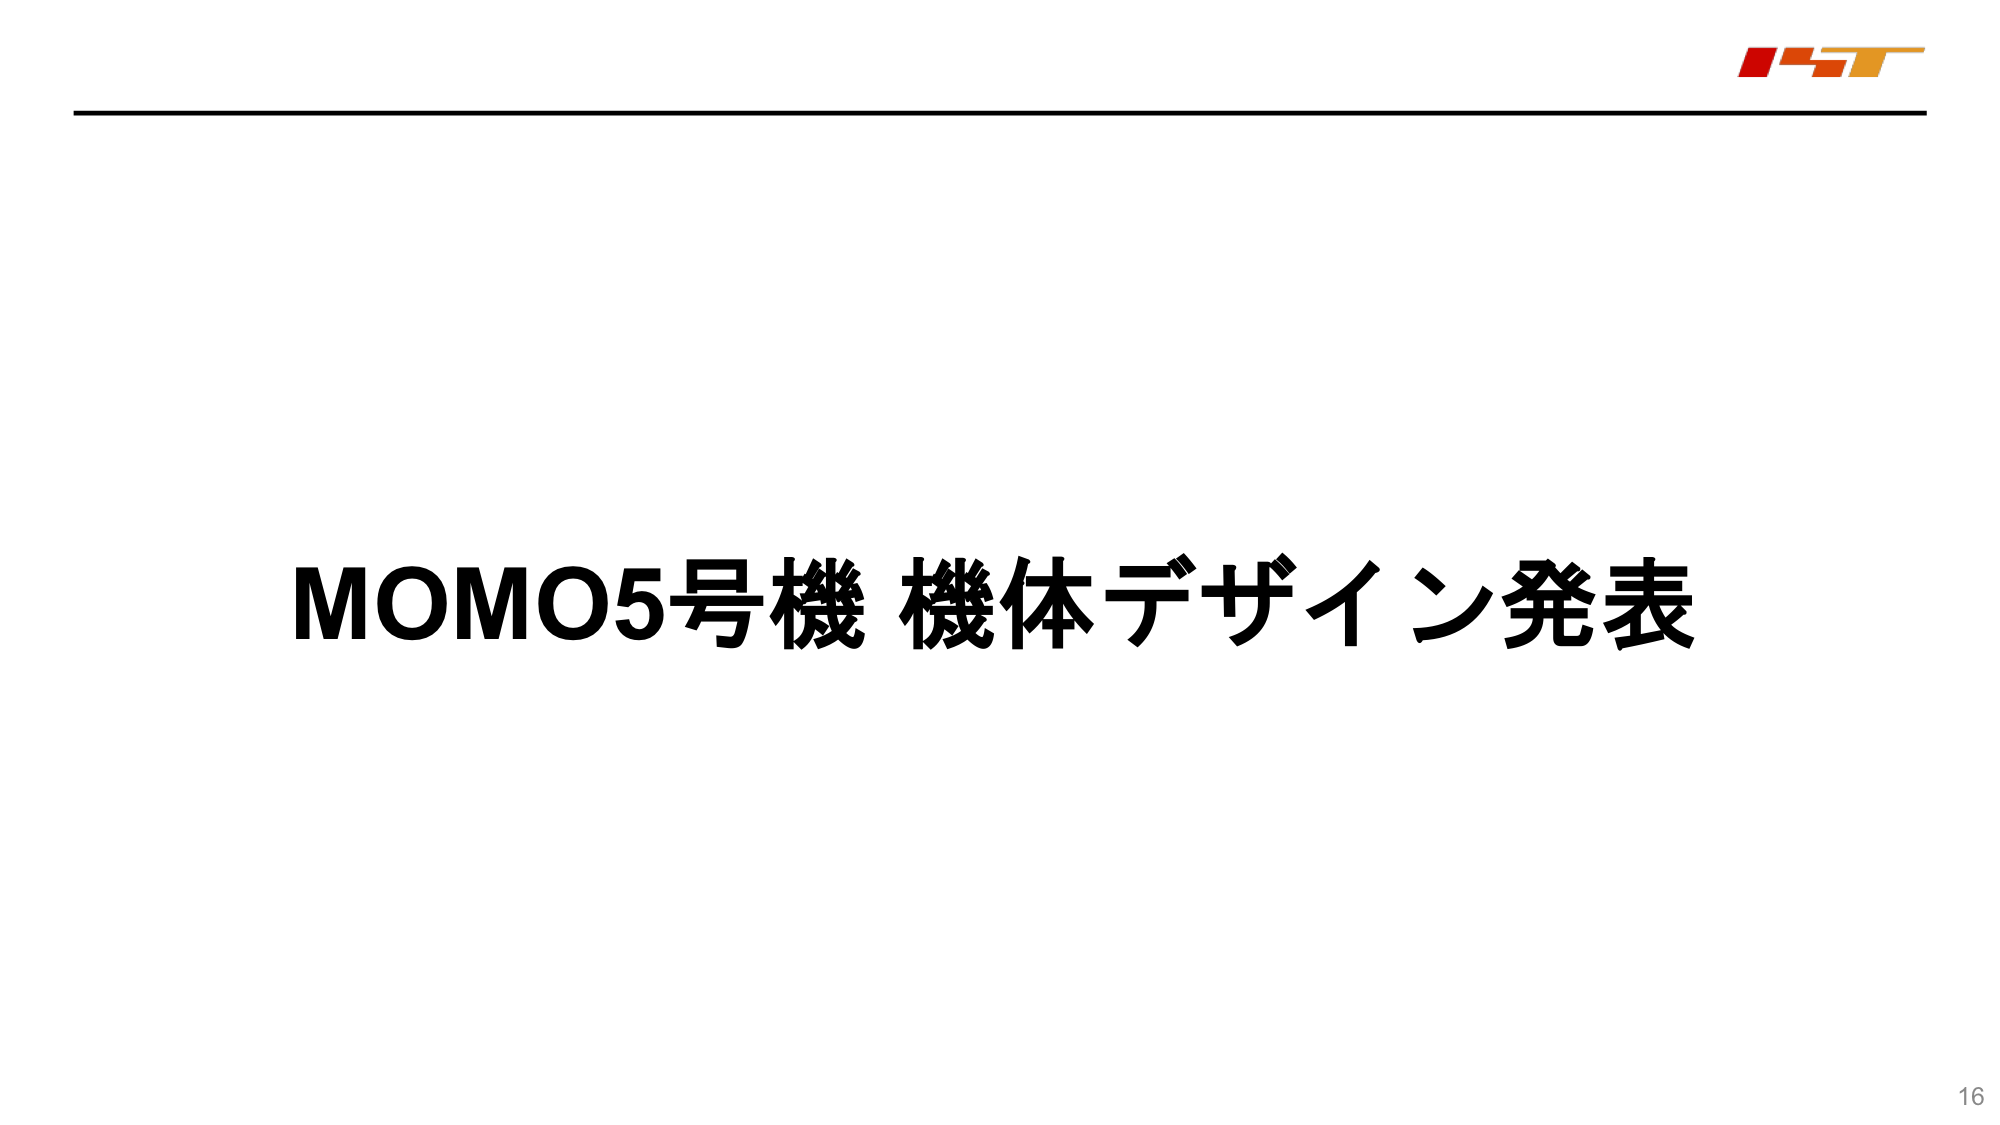 f:id:Imamura:20191126135135p:plain